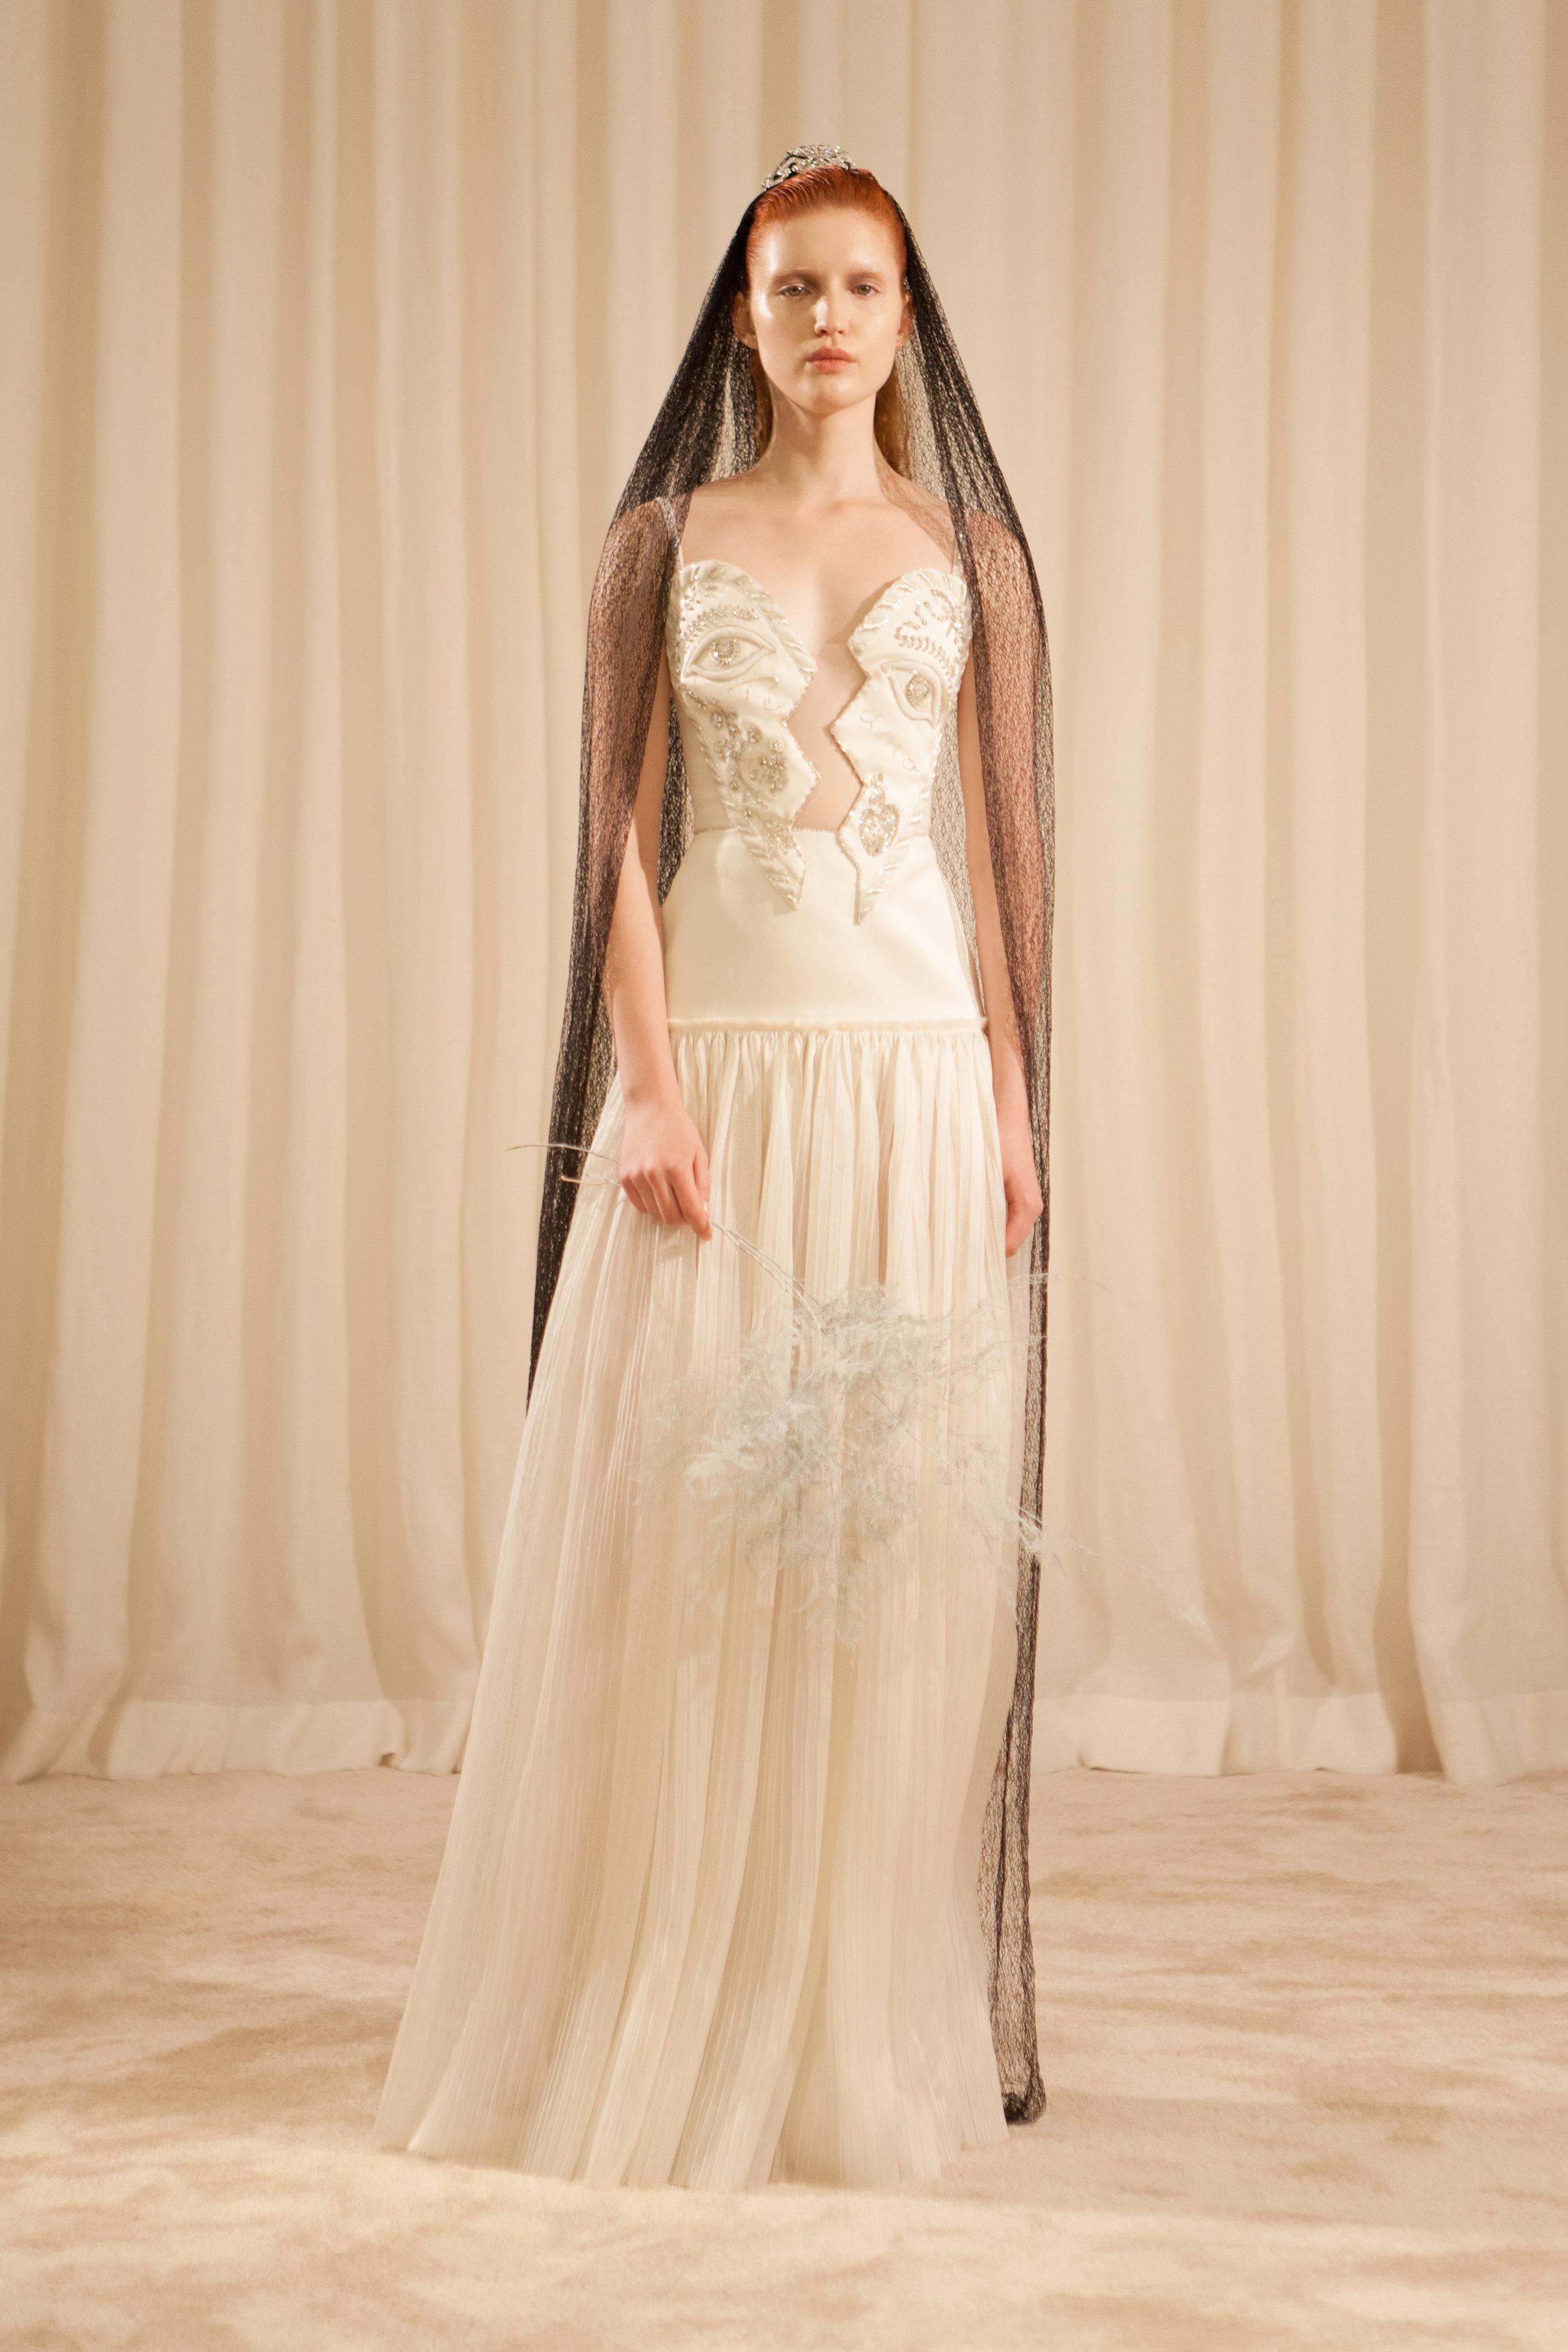 SandraMansour-S1-Lookbook-Bridal-05.jpg